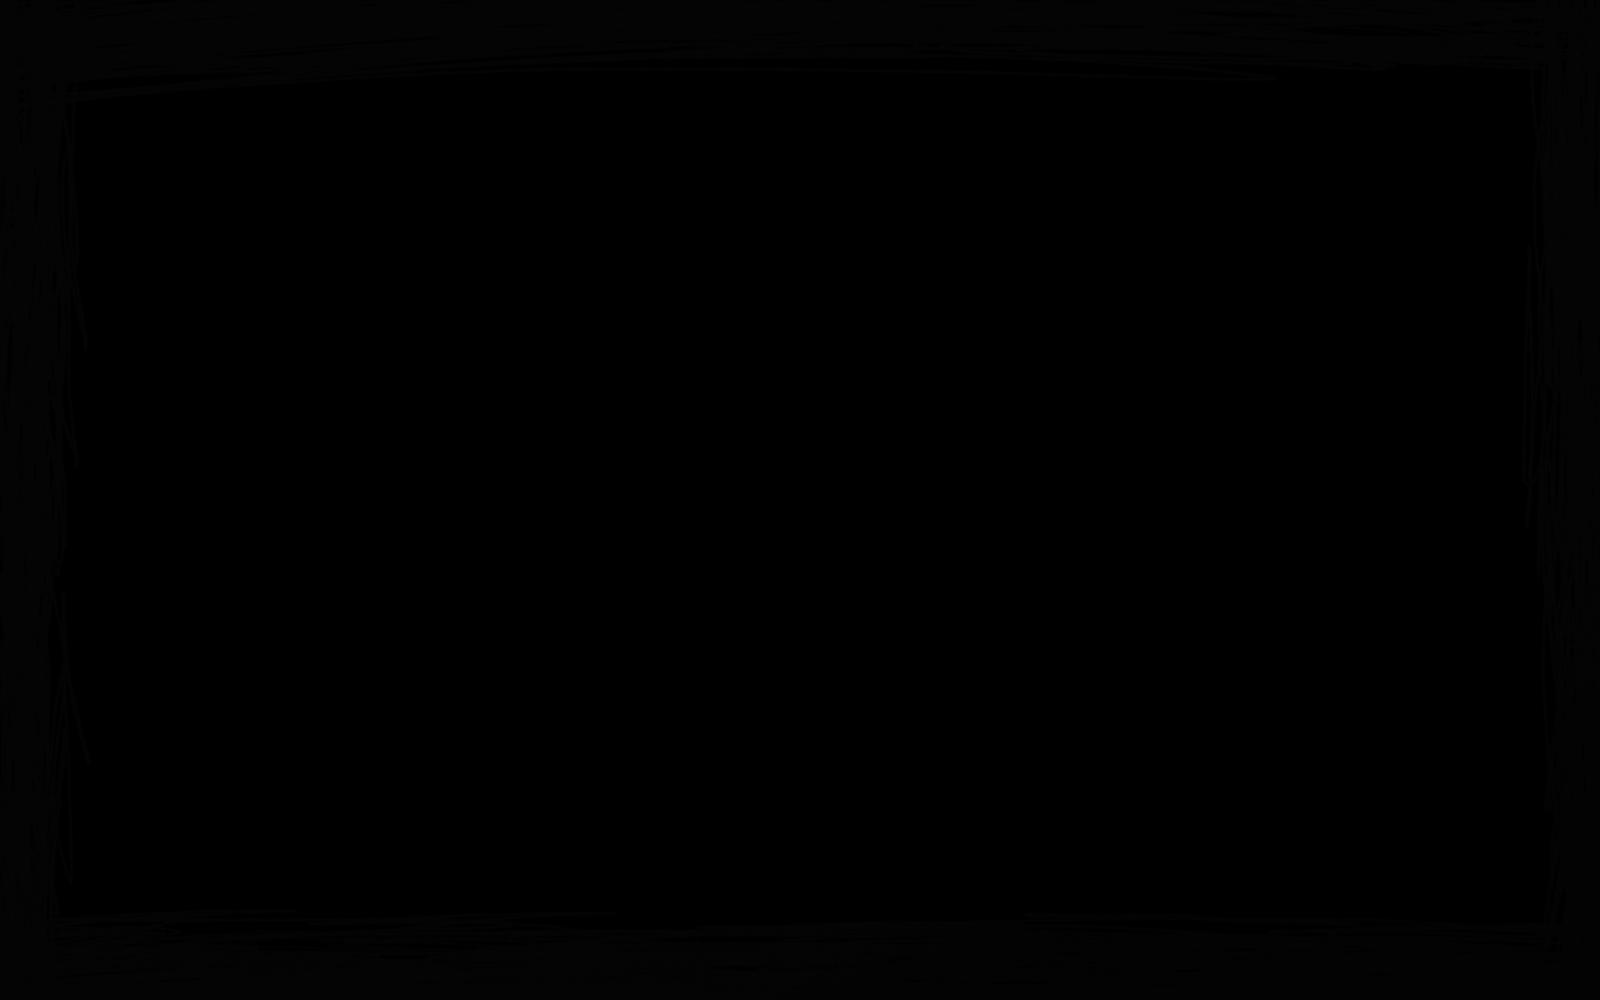 4 Rectangle Scribble Frame (PNG Transparent).